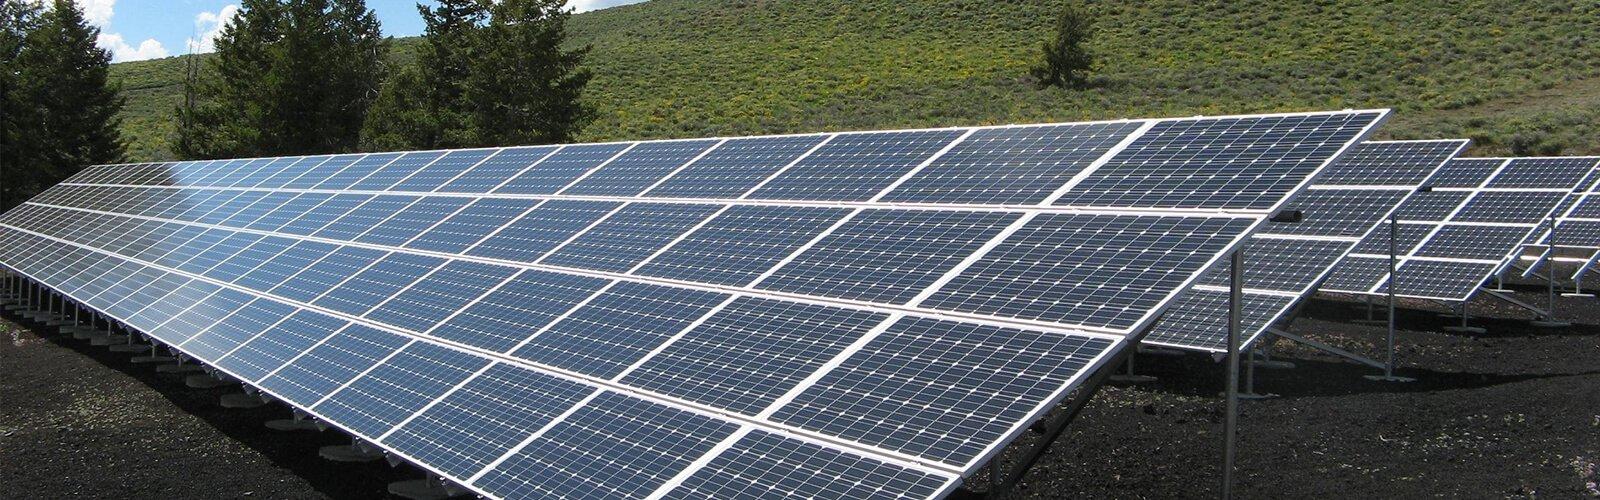 Best Solar PV EPC Contractors In India | SaveGeo